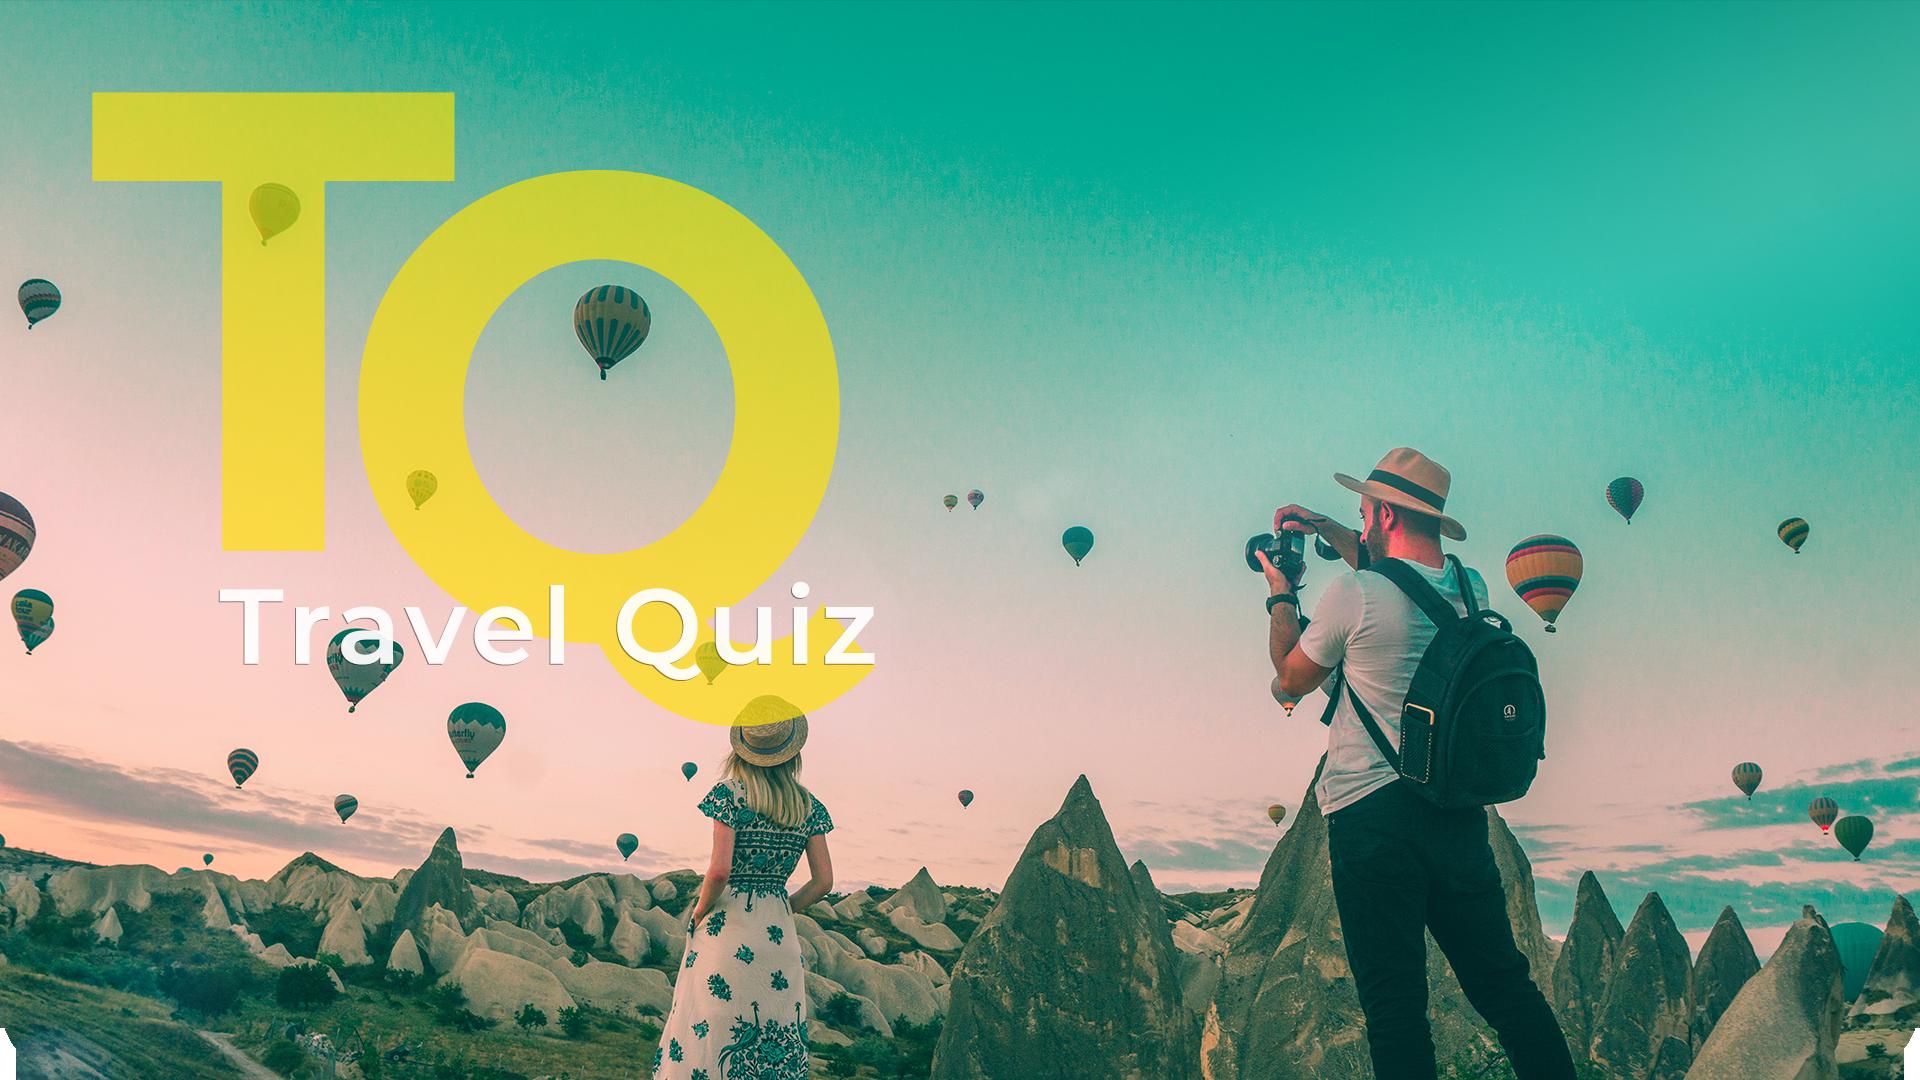 ⛱ Travel Quiz